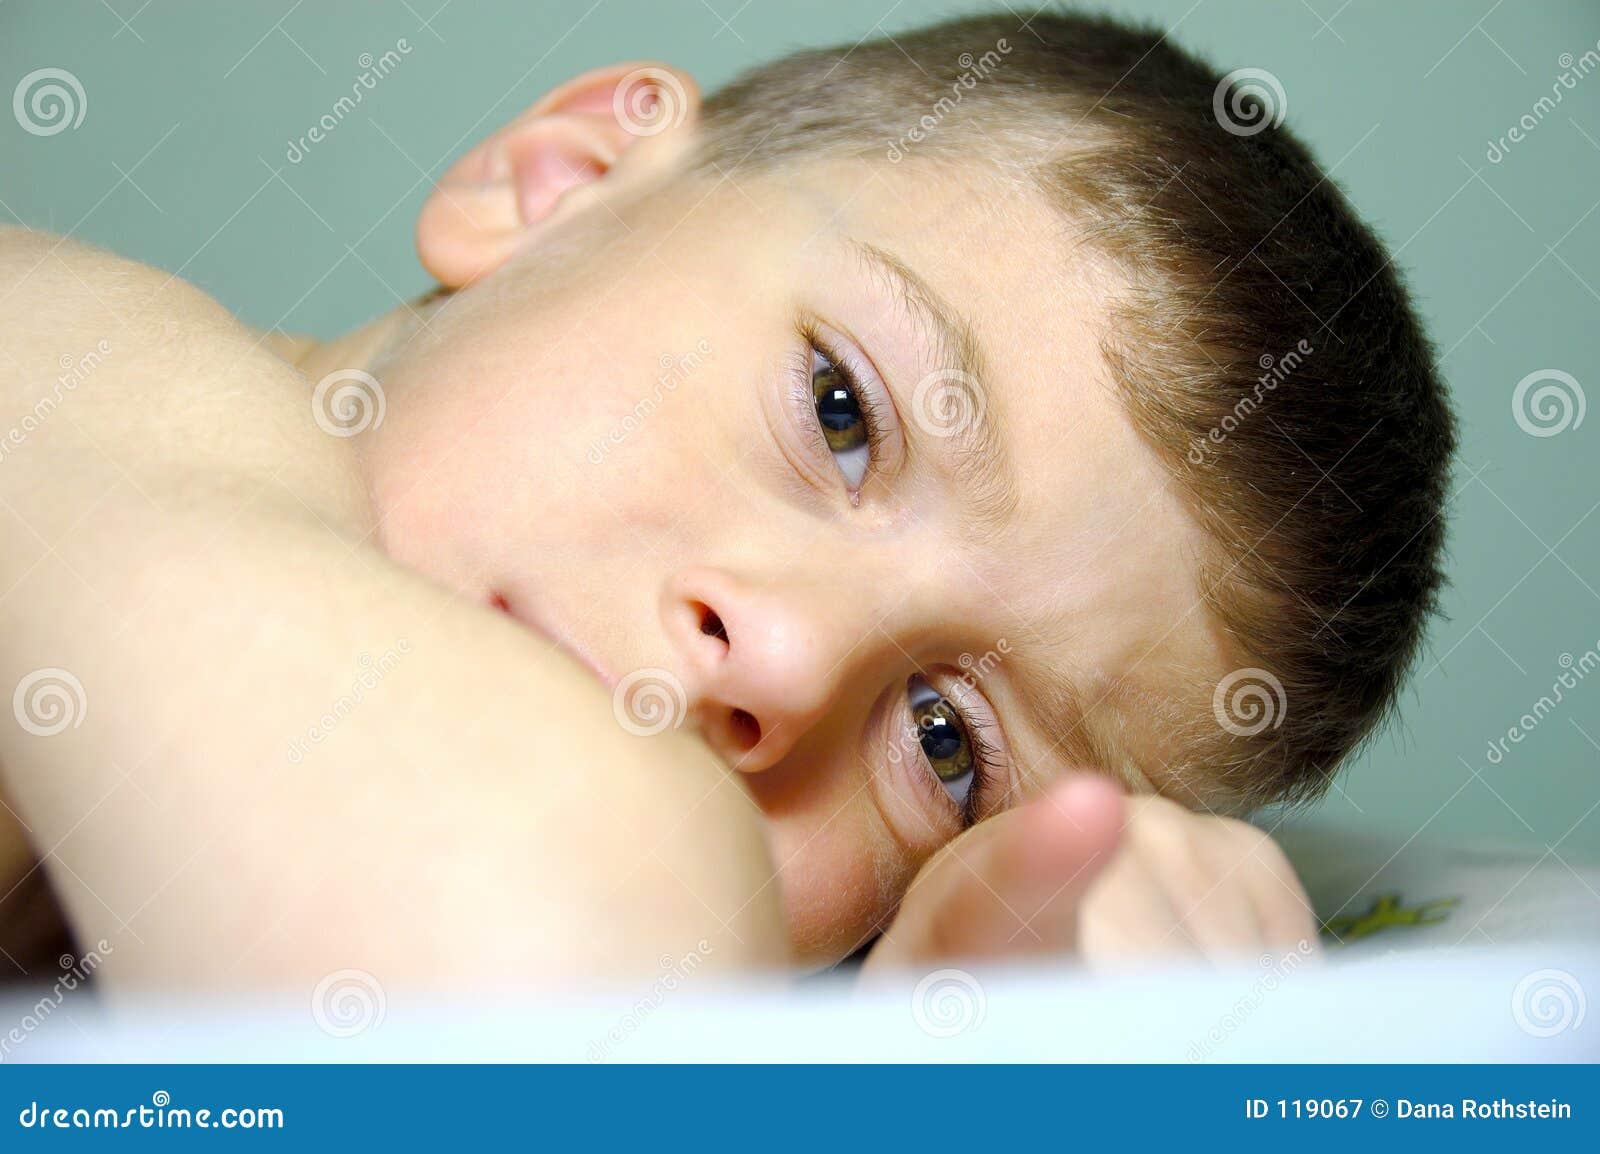 Child Laying Down